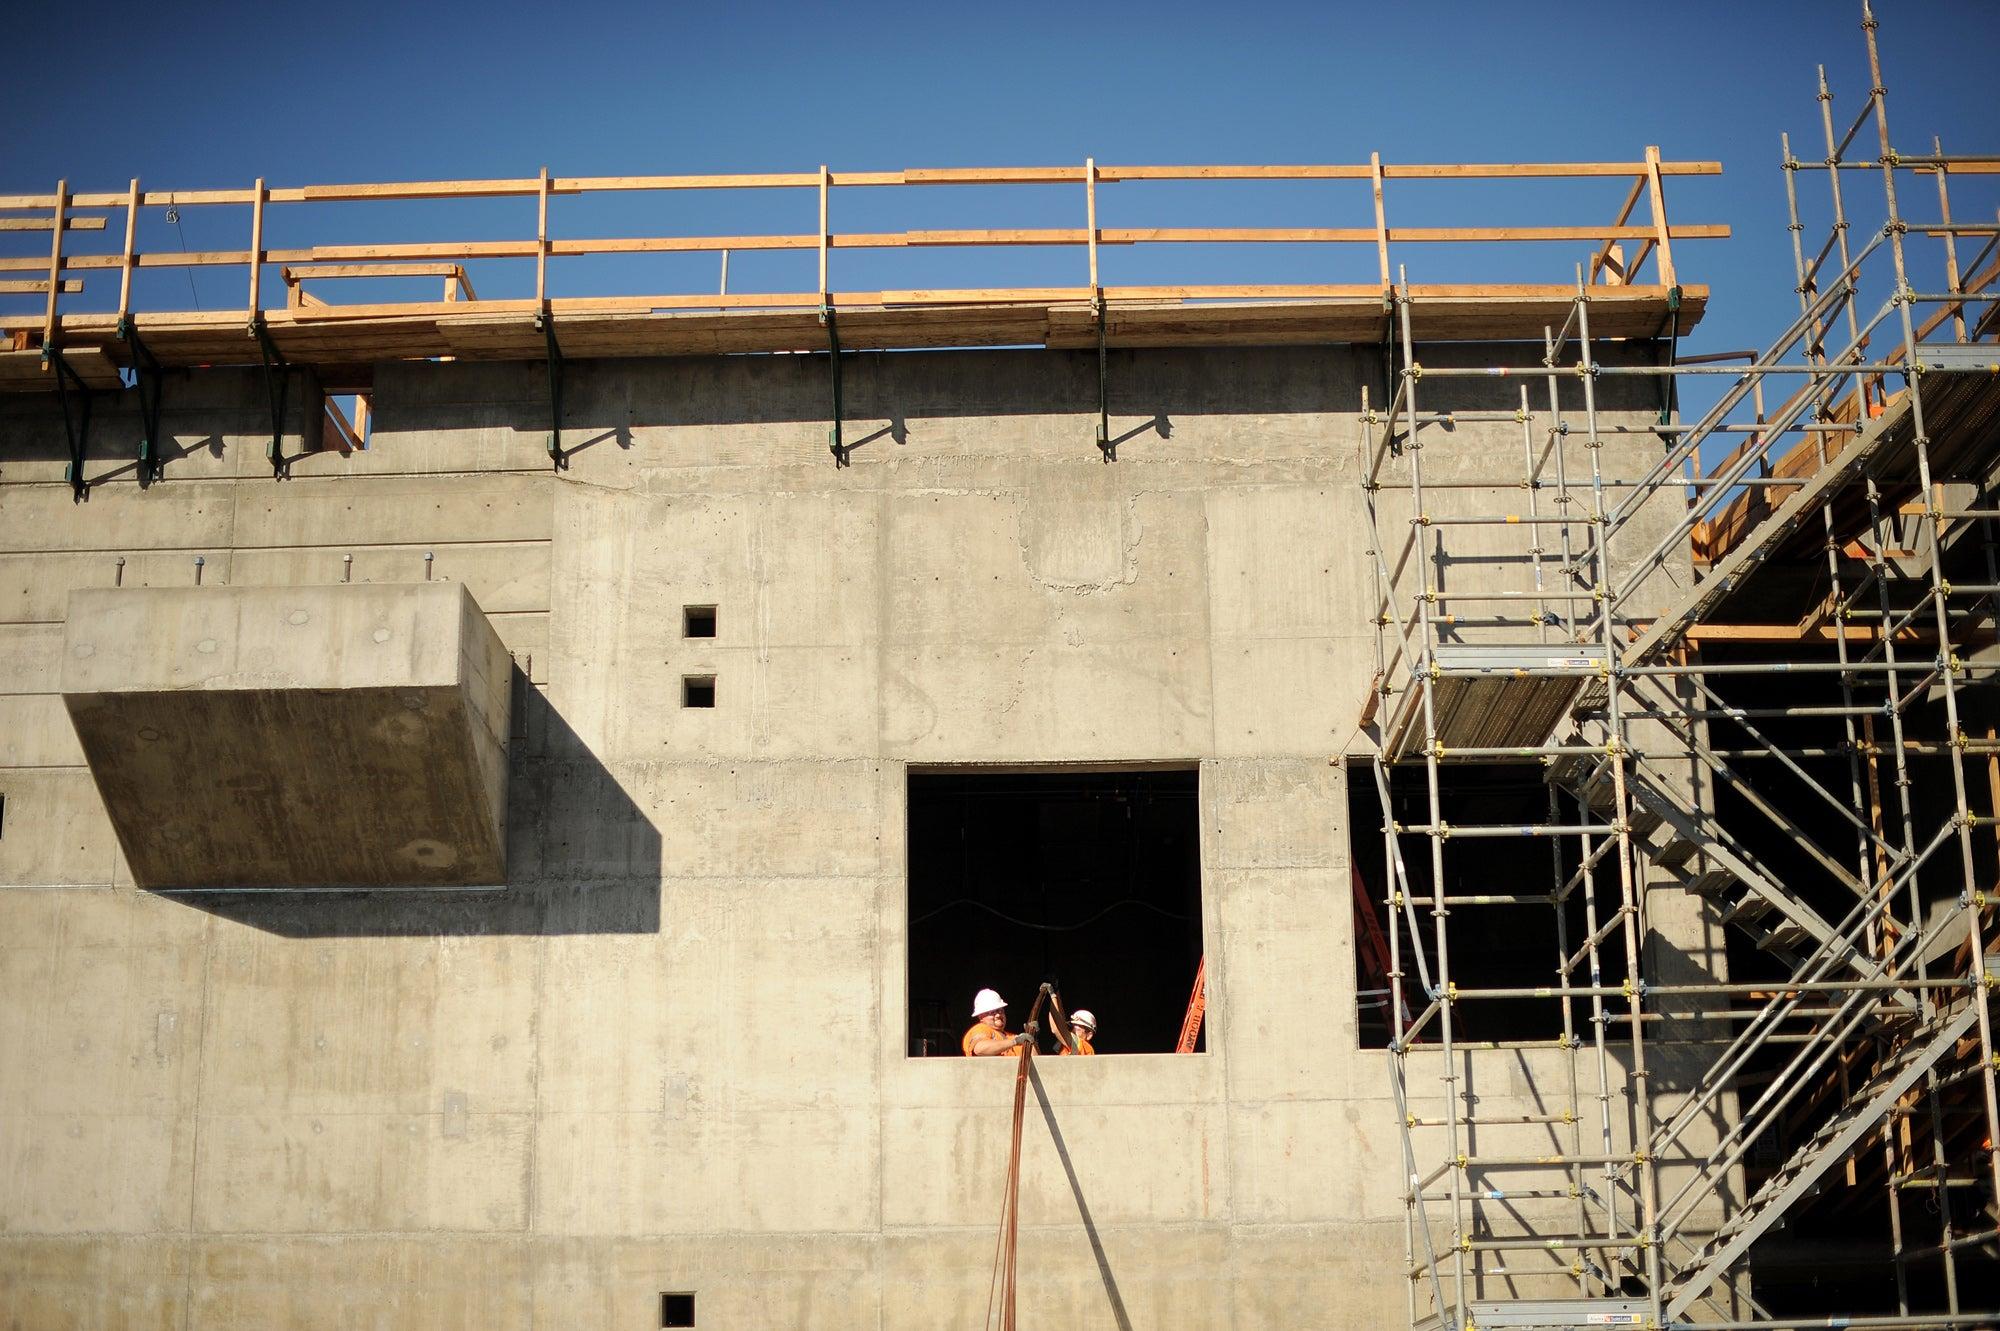 Oakland Airport Connector construction